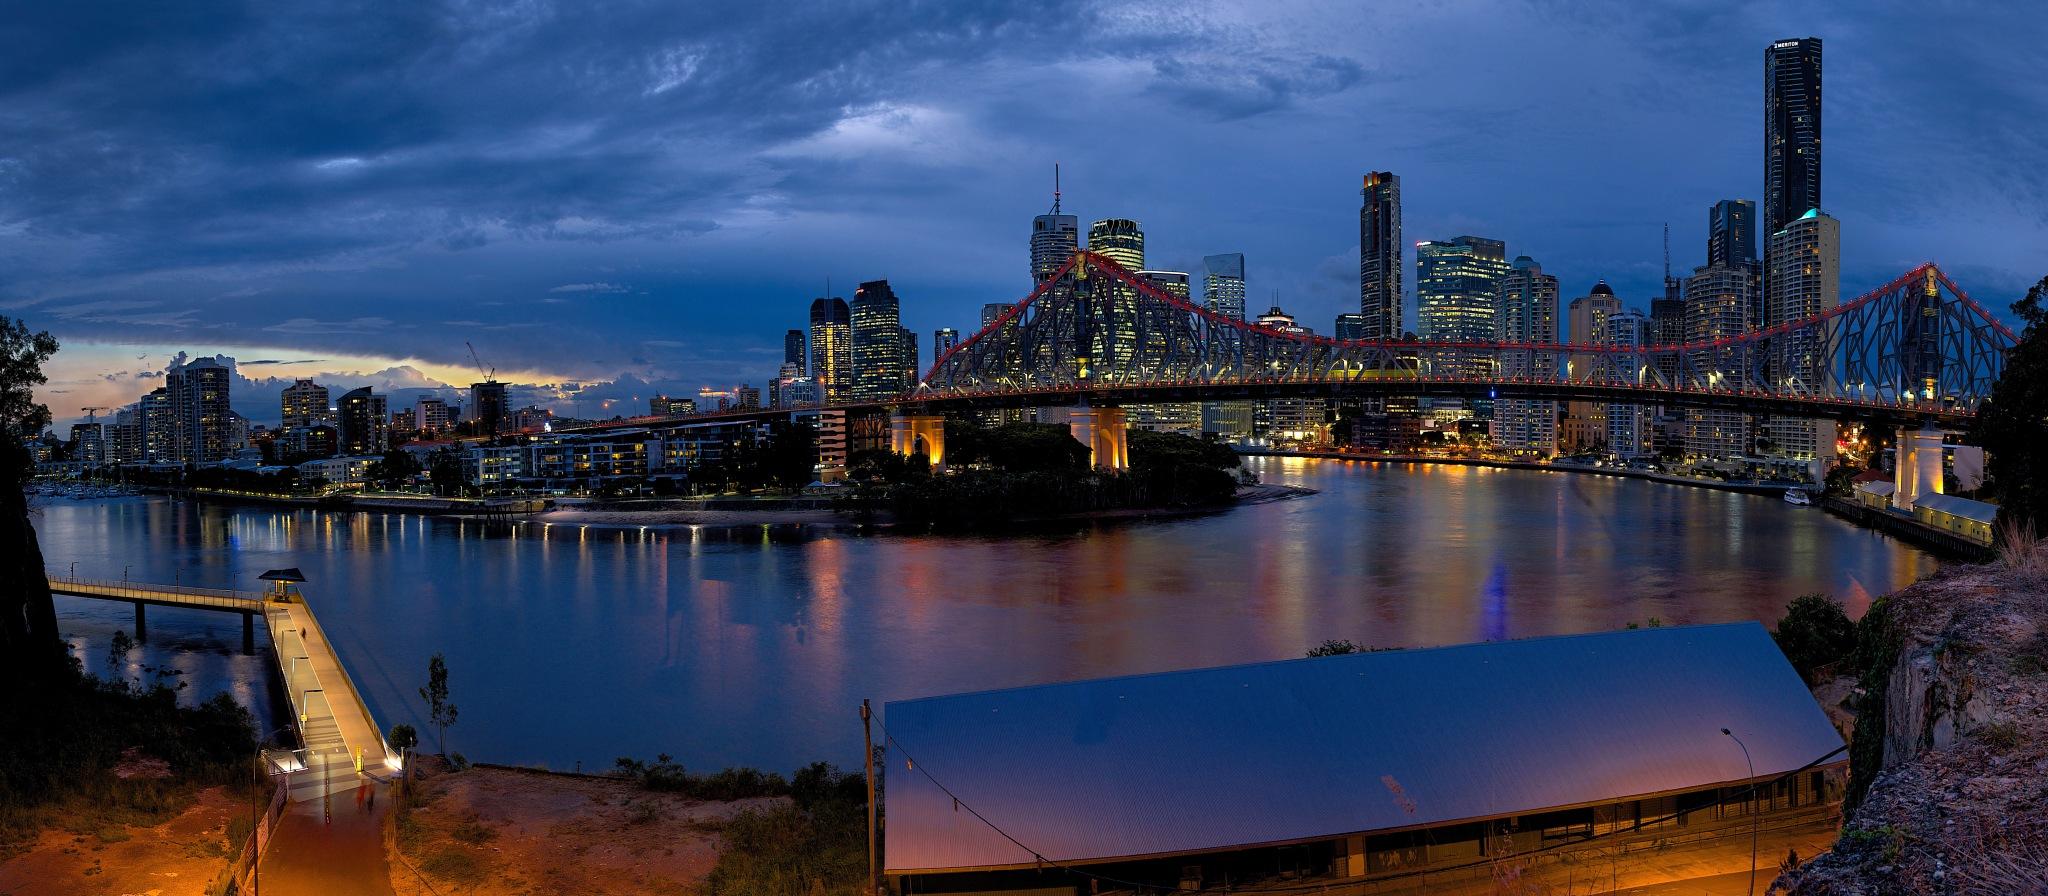 Brisbane Panorama (best viewed large) by EmanuelPapamanolis